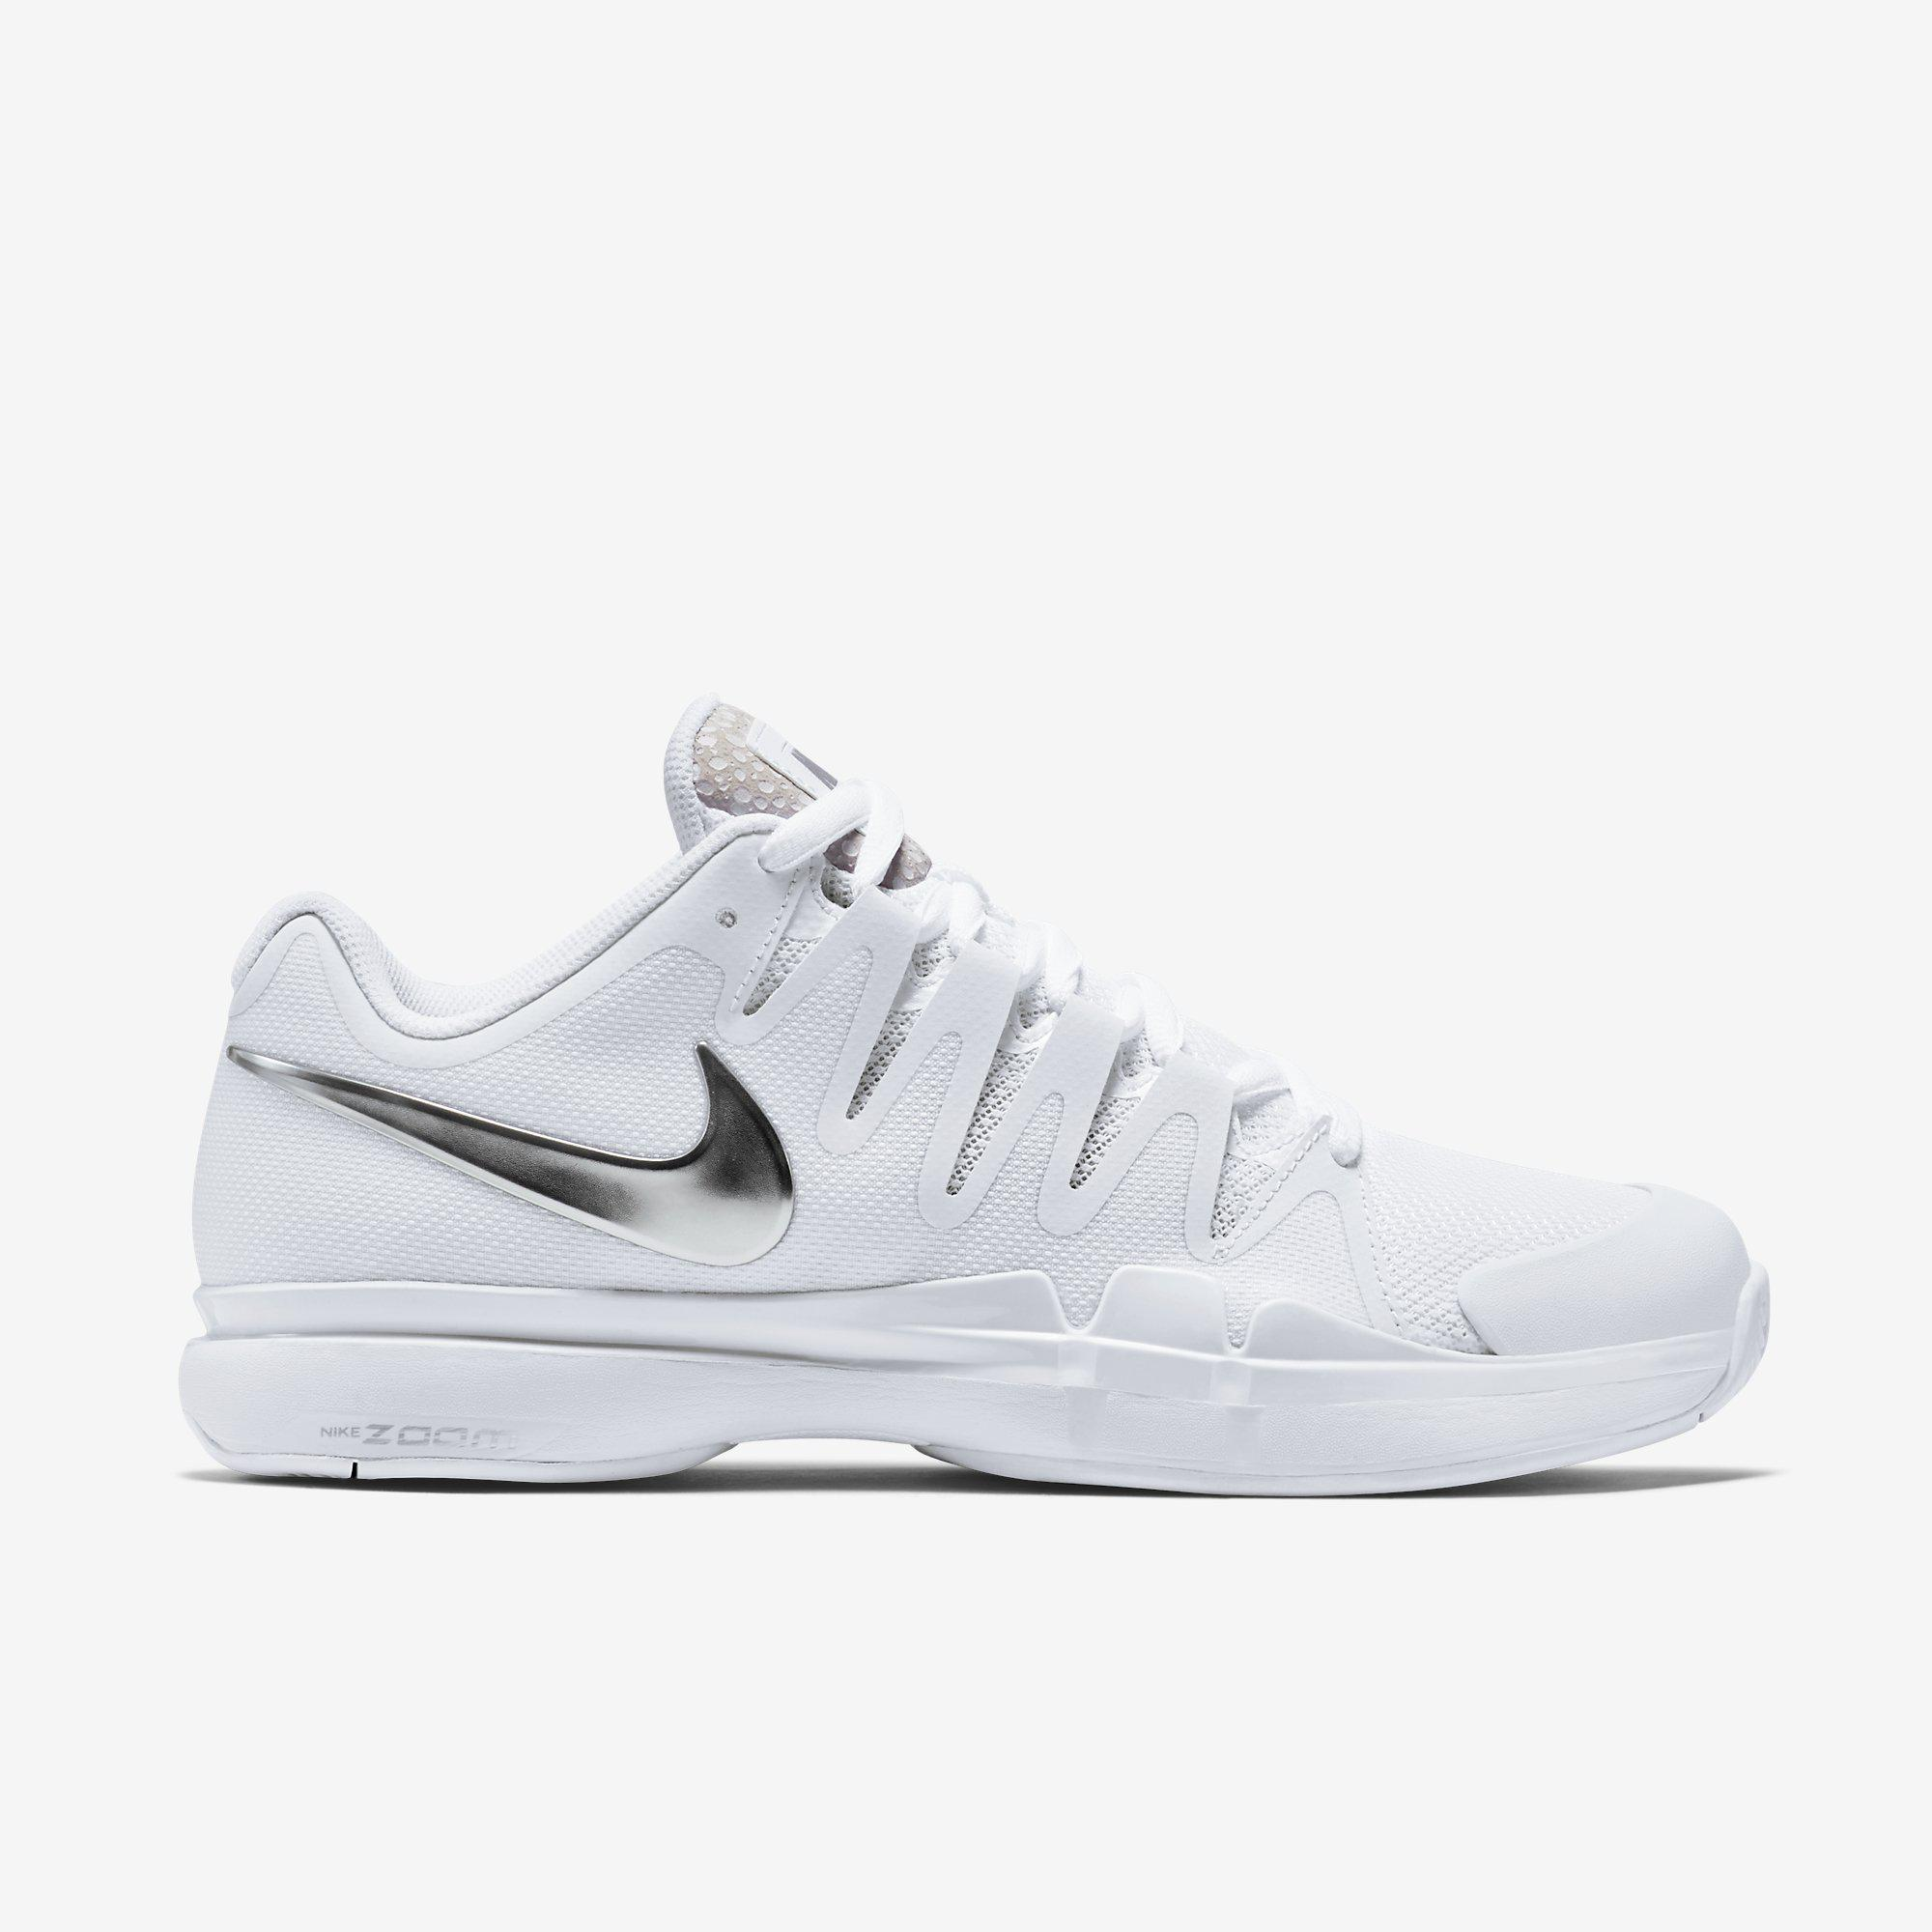 94016eddfc1b1 Nike Mens Zoom Vapor 9.5 Tour Safari Grass Tennis Shoes - White  Limited  Edition  - Tennisnuts.com